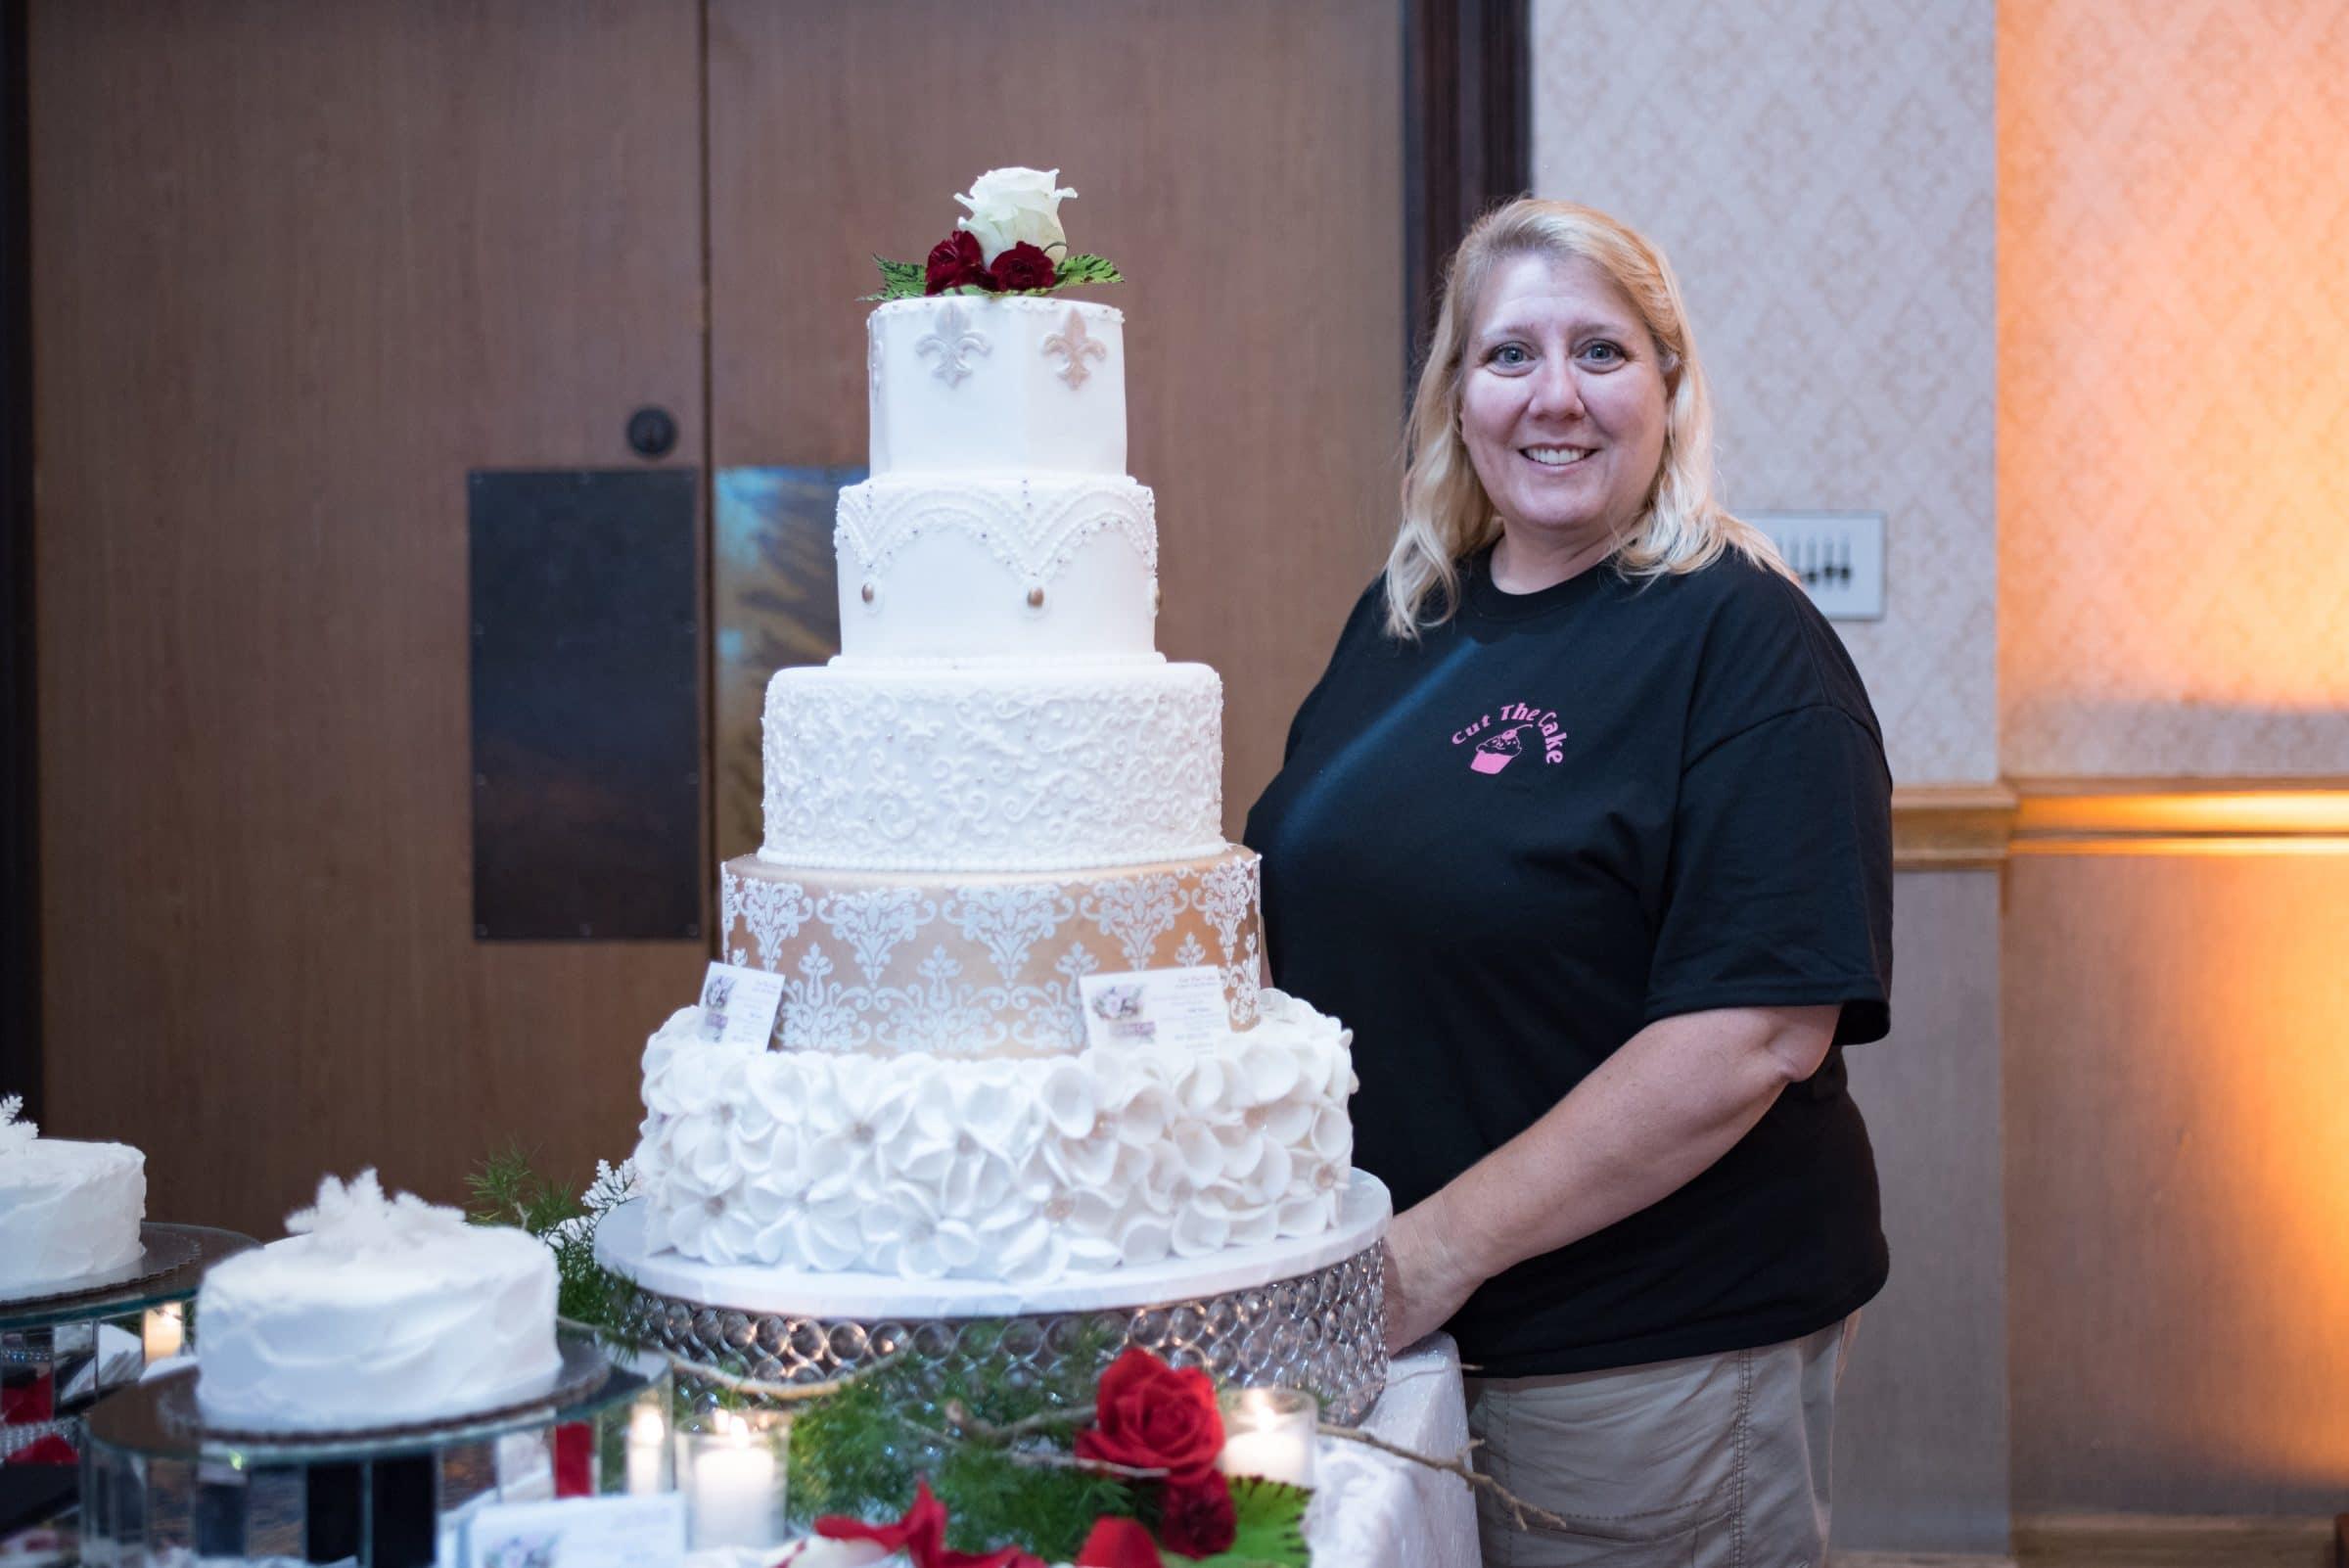 Woman standing next to five tier wedding cake